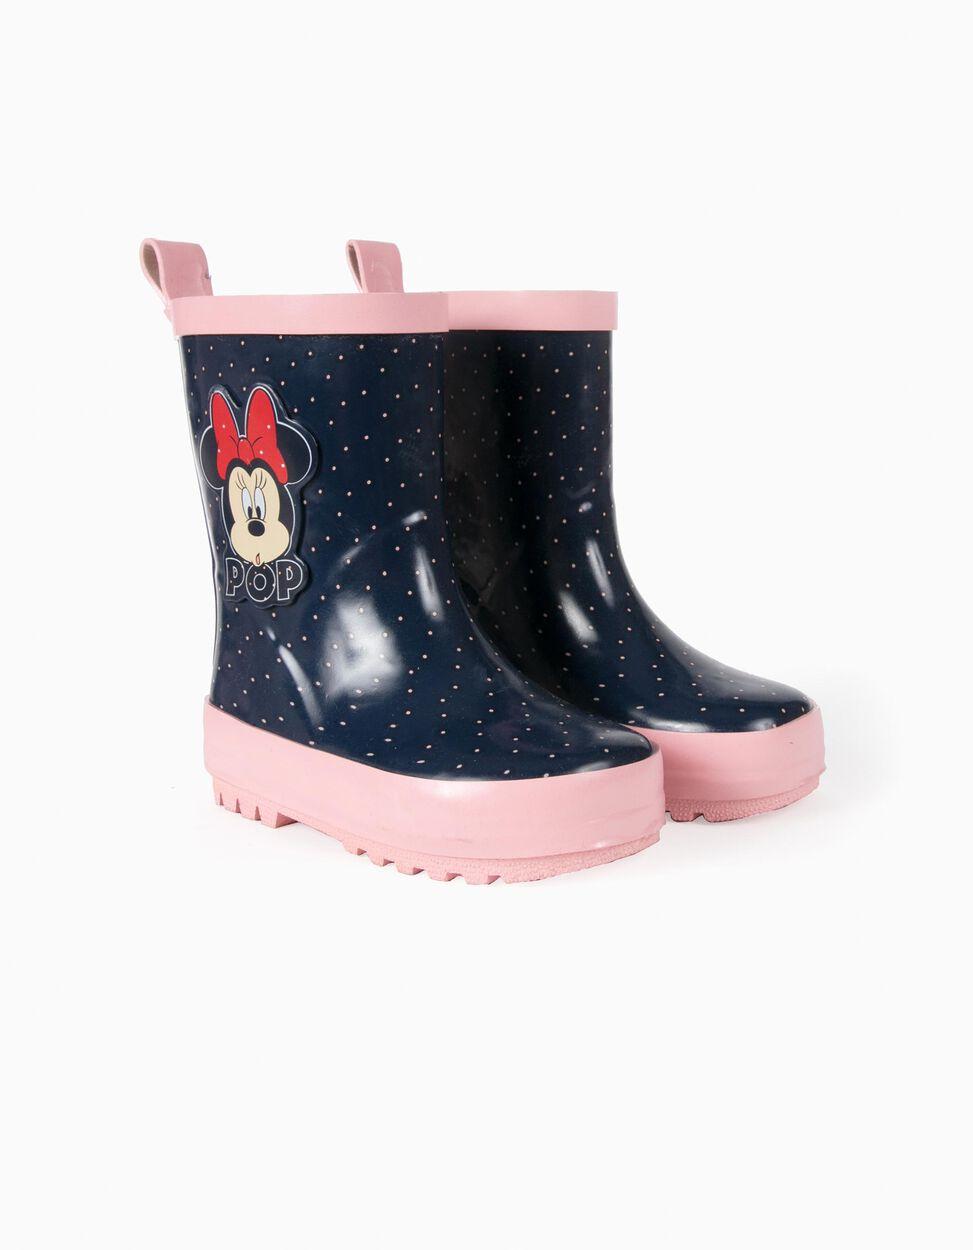 Botas Borracha Minnie Pop